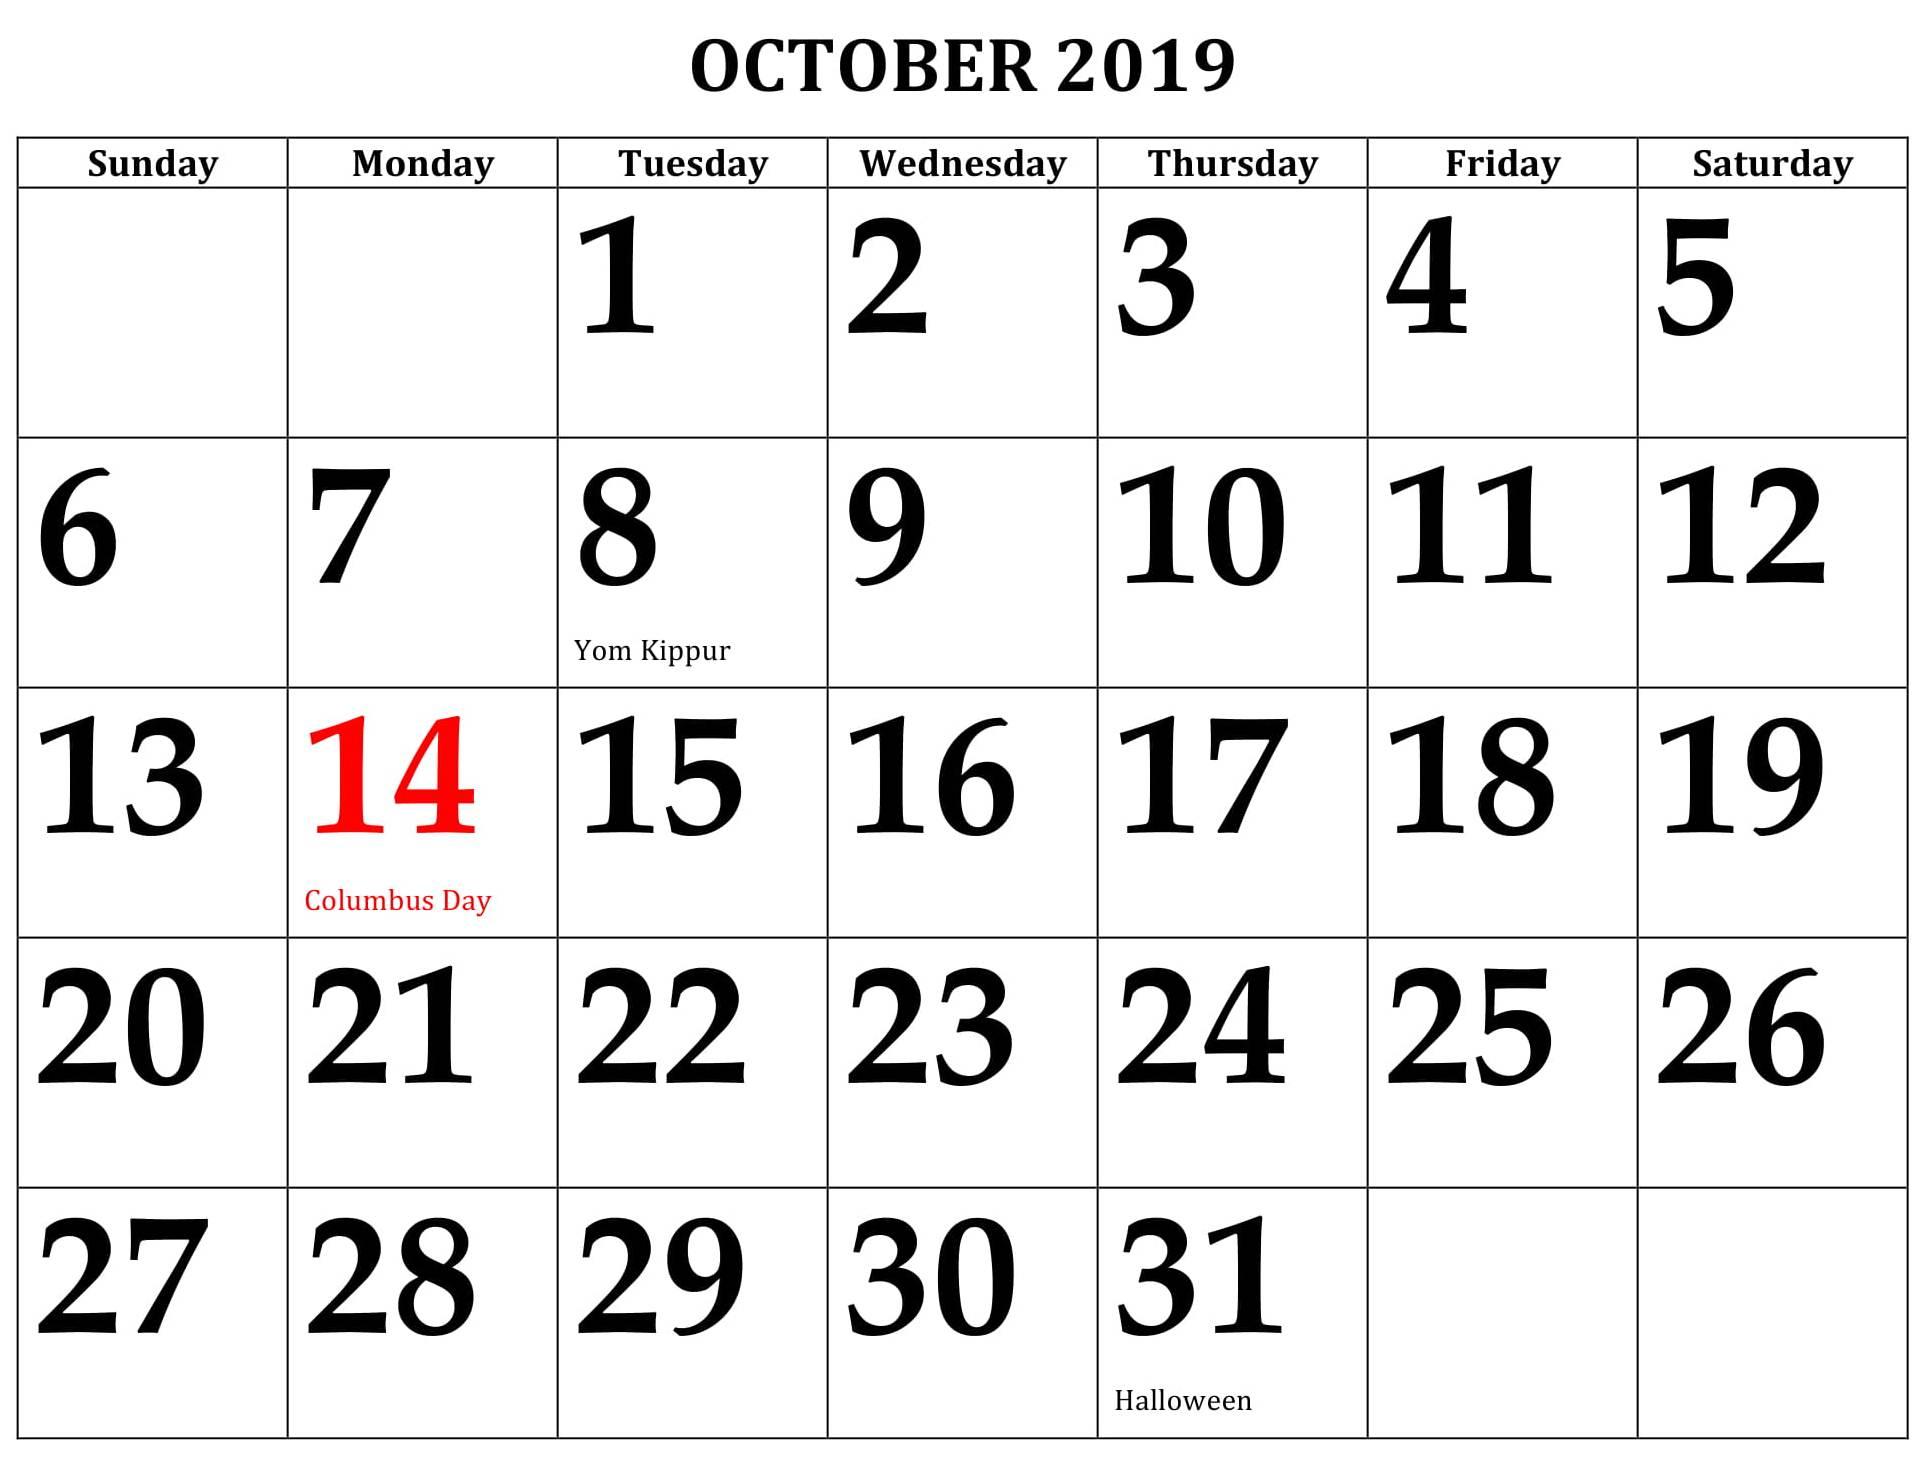 October 2019 Calendar Us Federal Holidays - 2019 Calendars